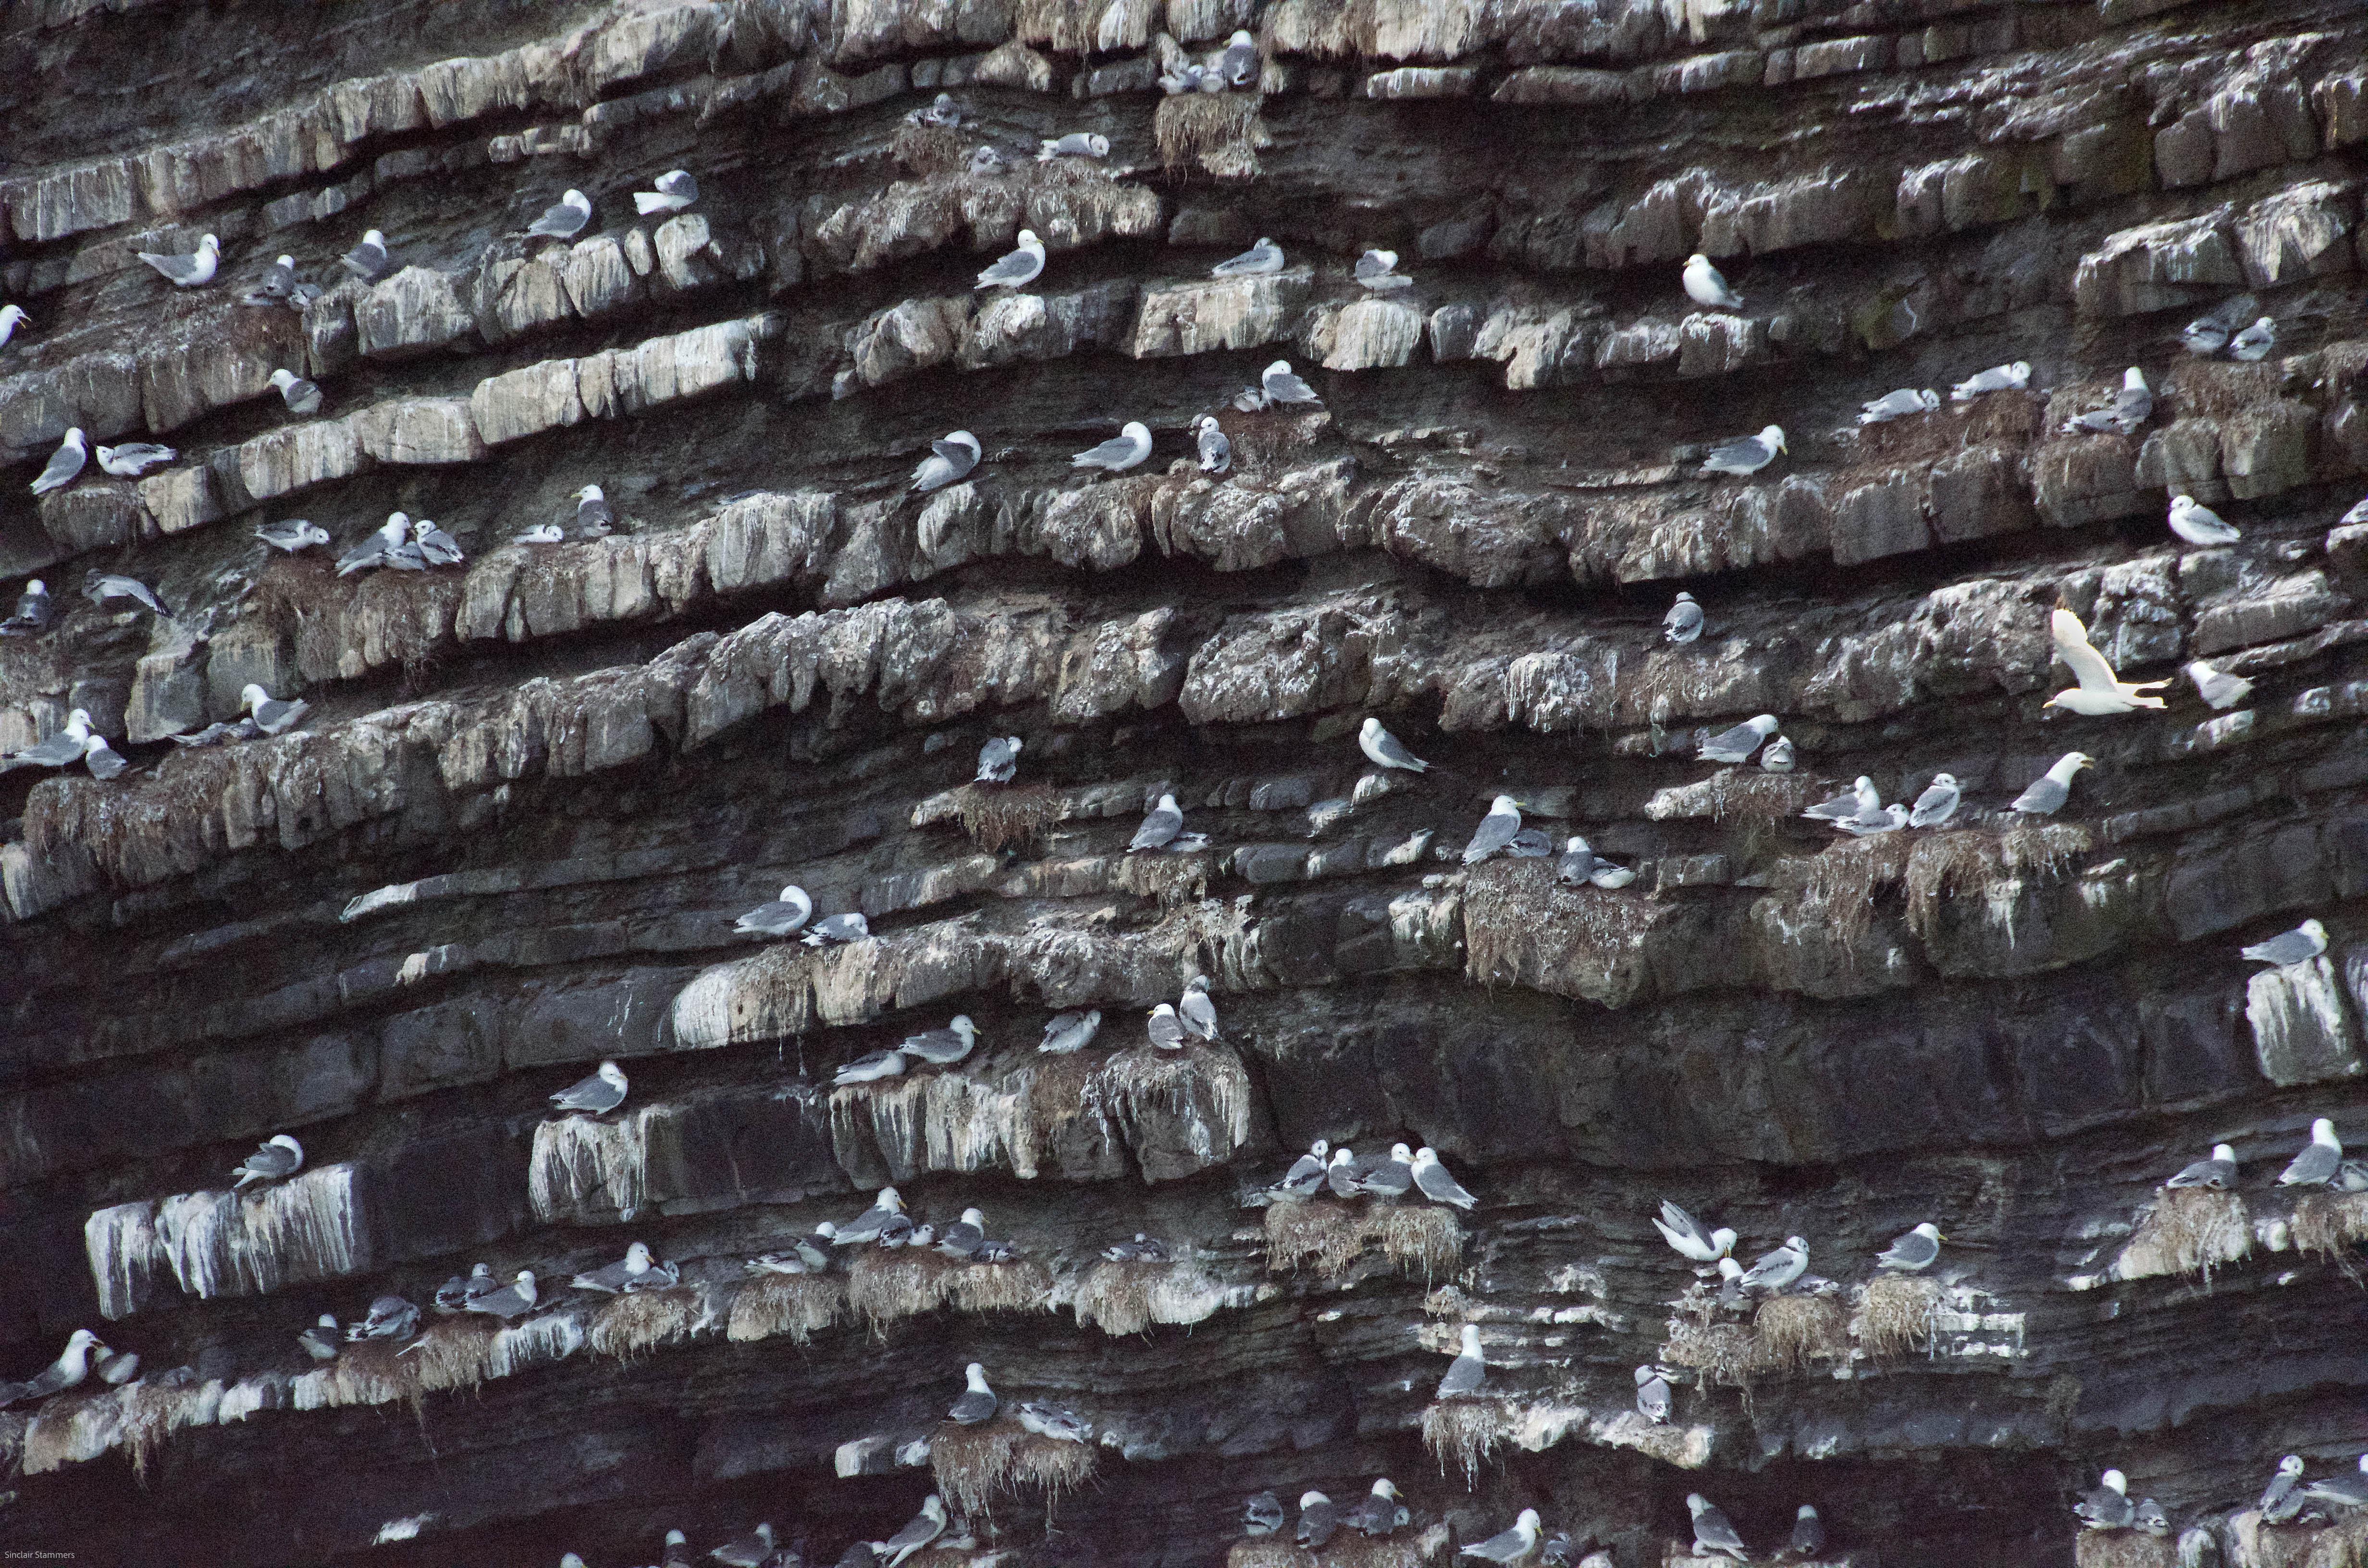 Kittiwake nesting site at Newport, Ceredigion